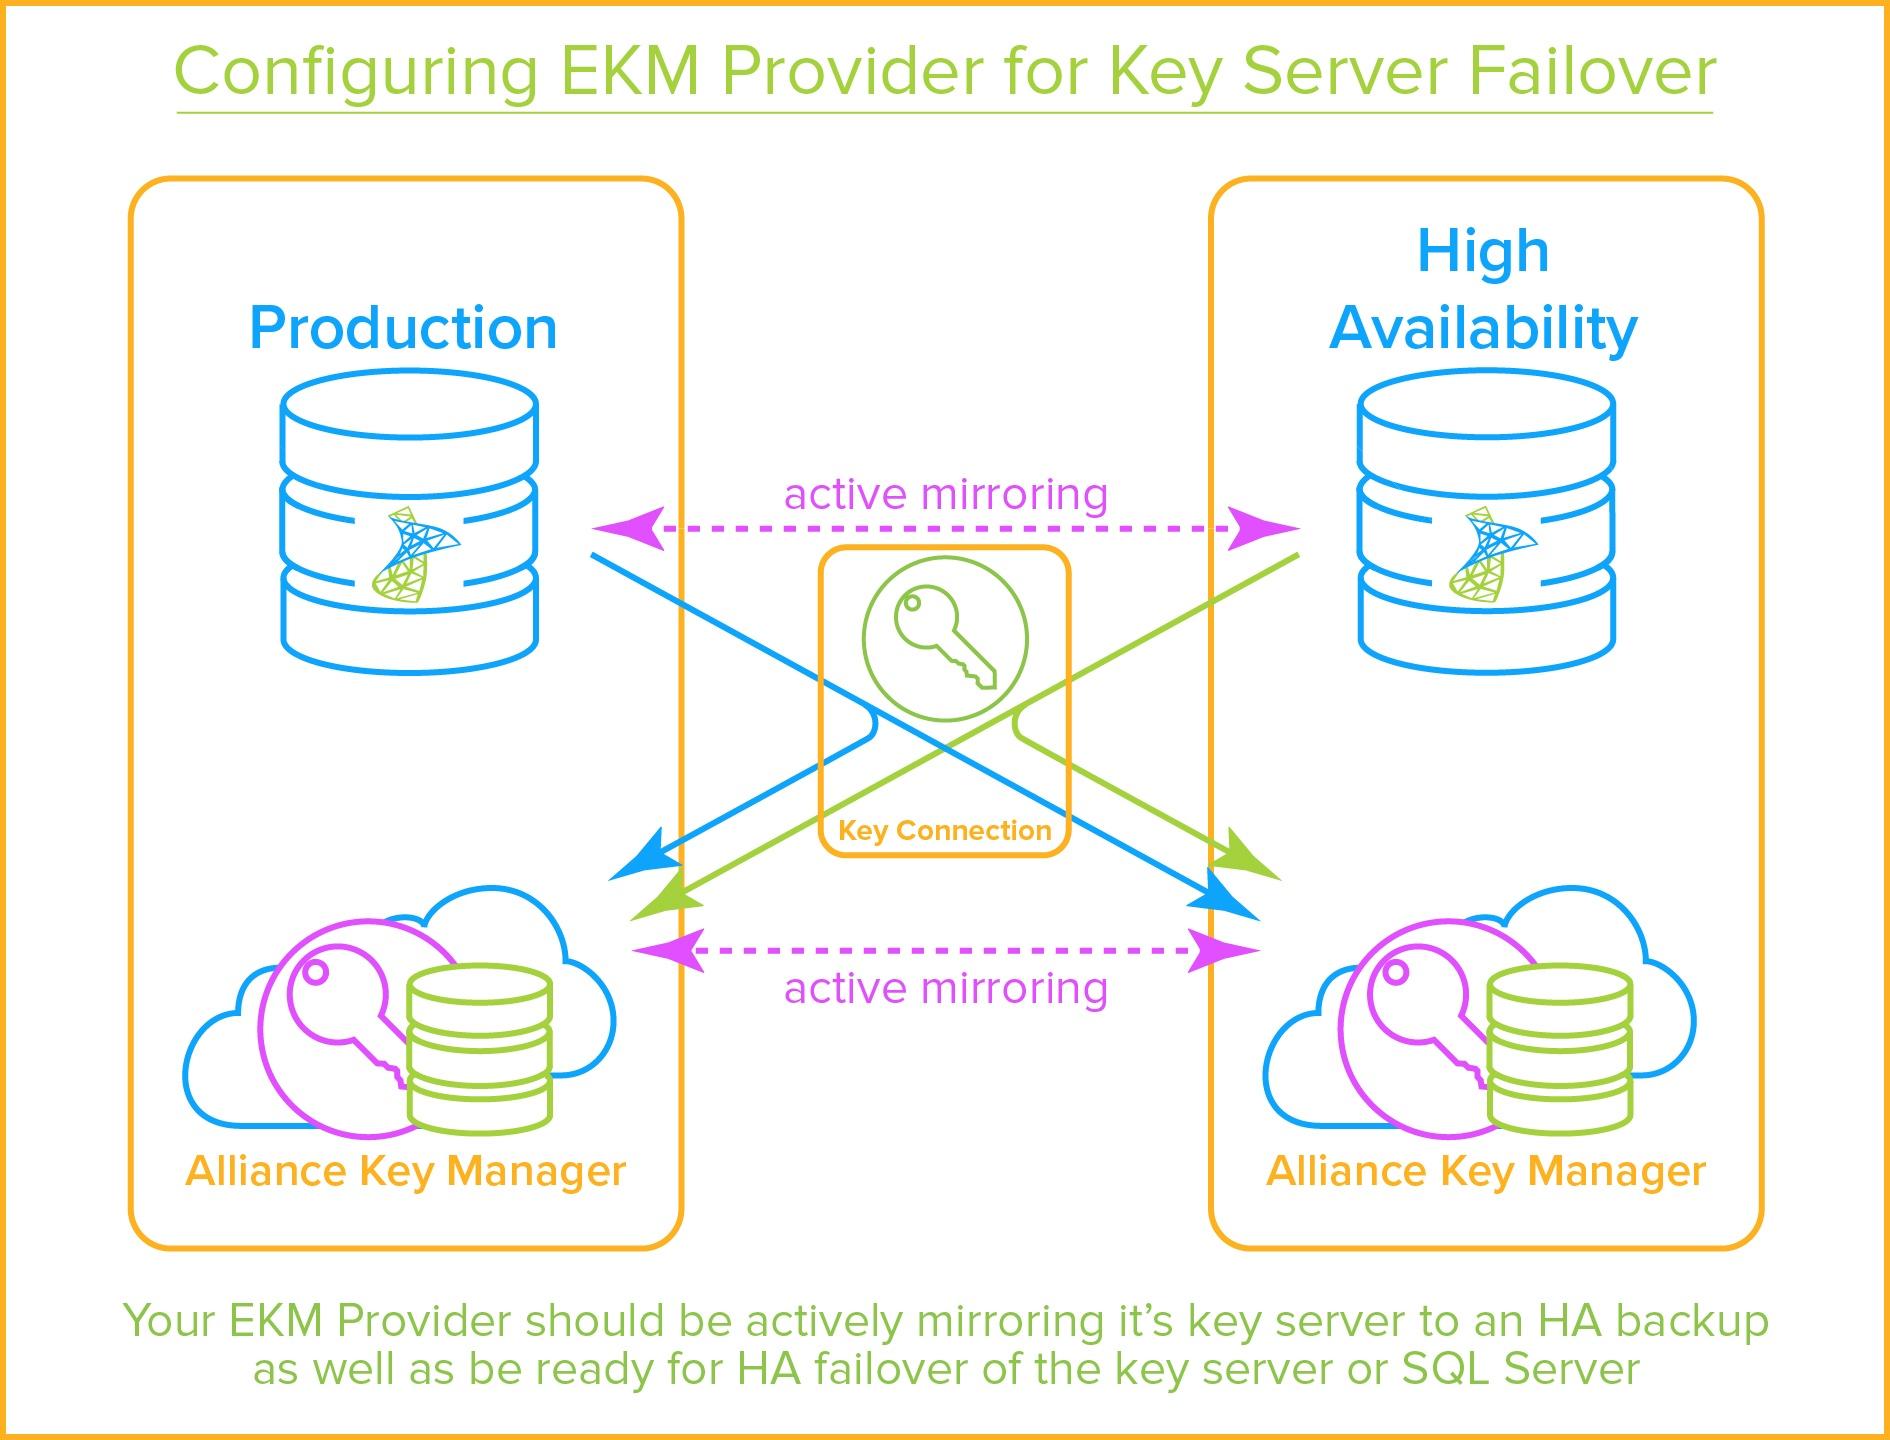 SQL Server Encryption - EKM Provider Key Server Failover